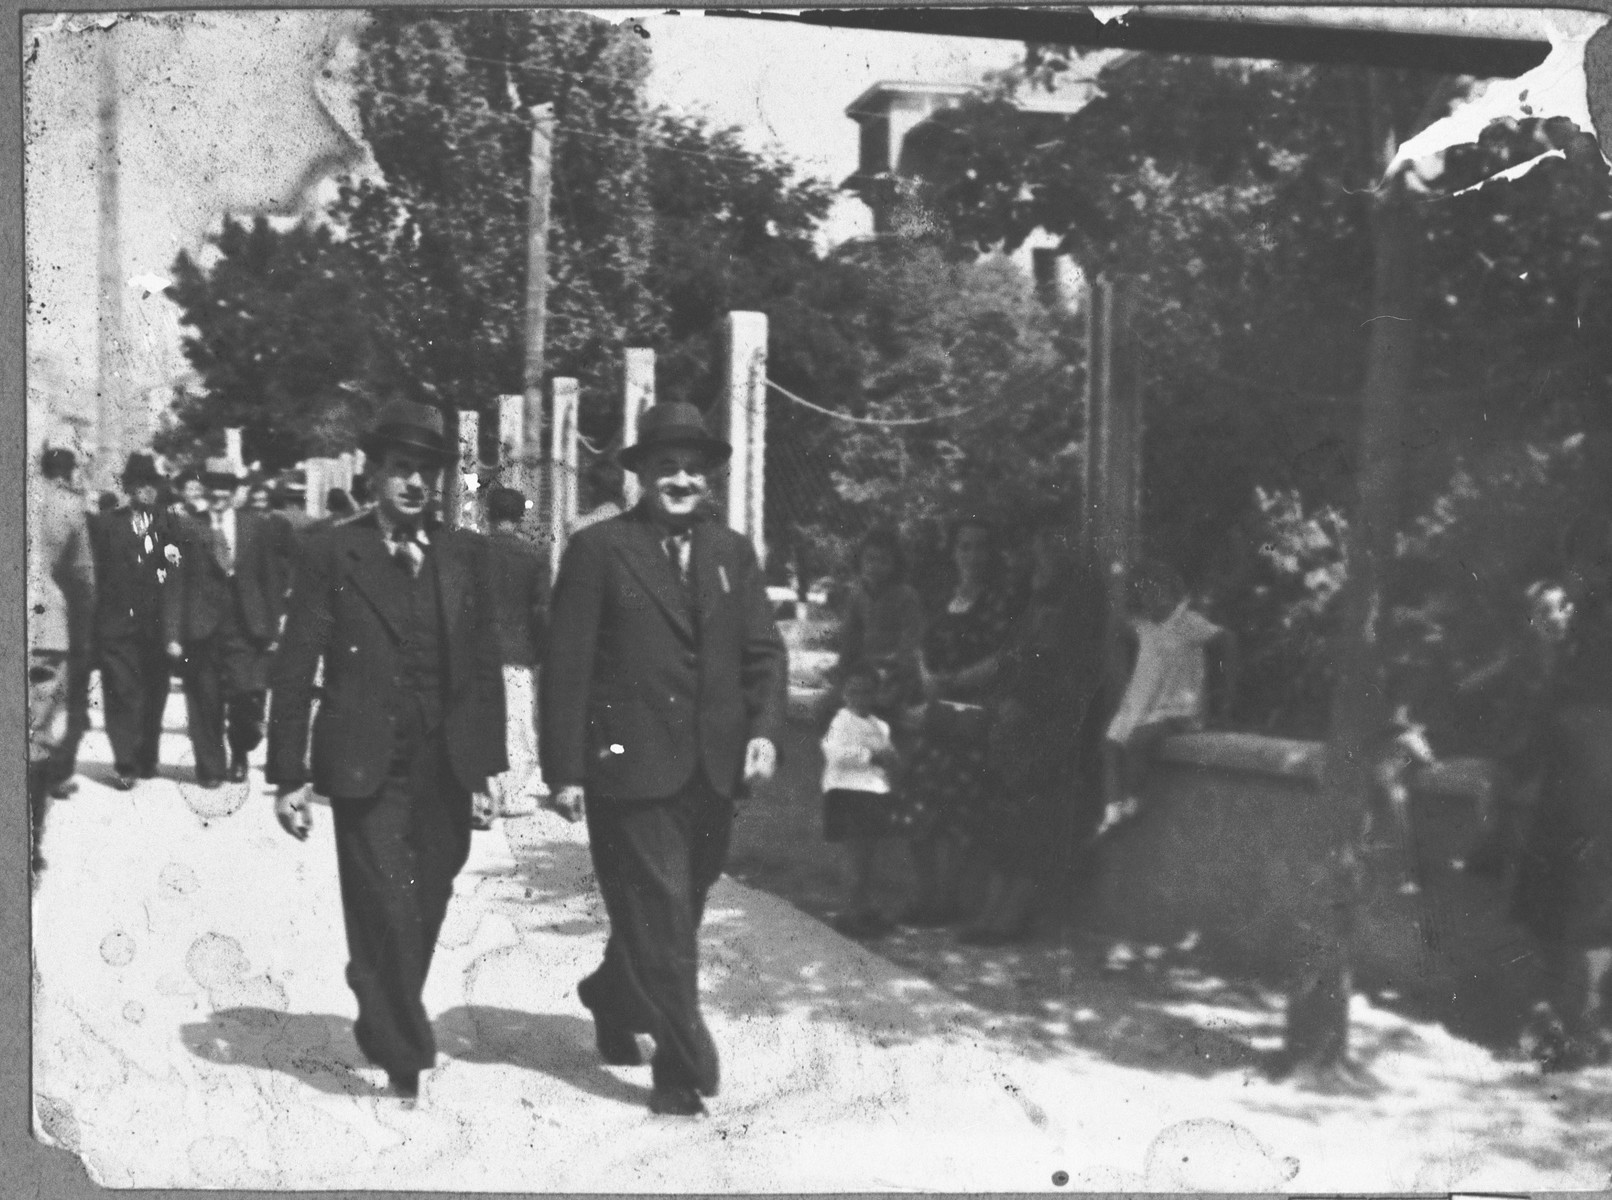 Street photo of Leon Kamchi and Isak Kolonomos.  Leon lived at Dr. Raisa 141 in Bitola.  Isak lived at Karaitza 10 in Bitola.